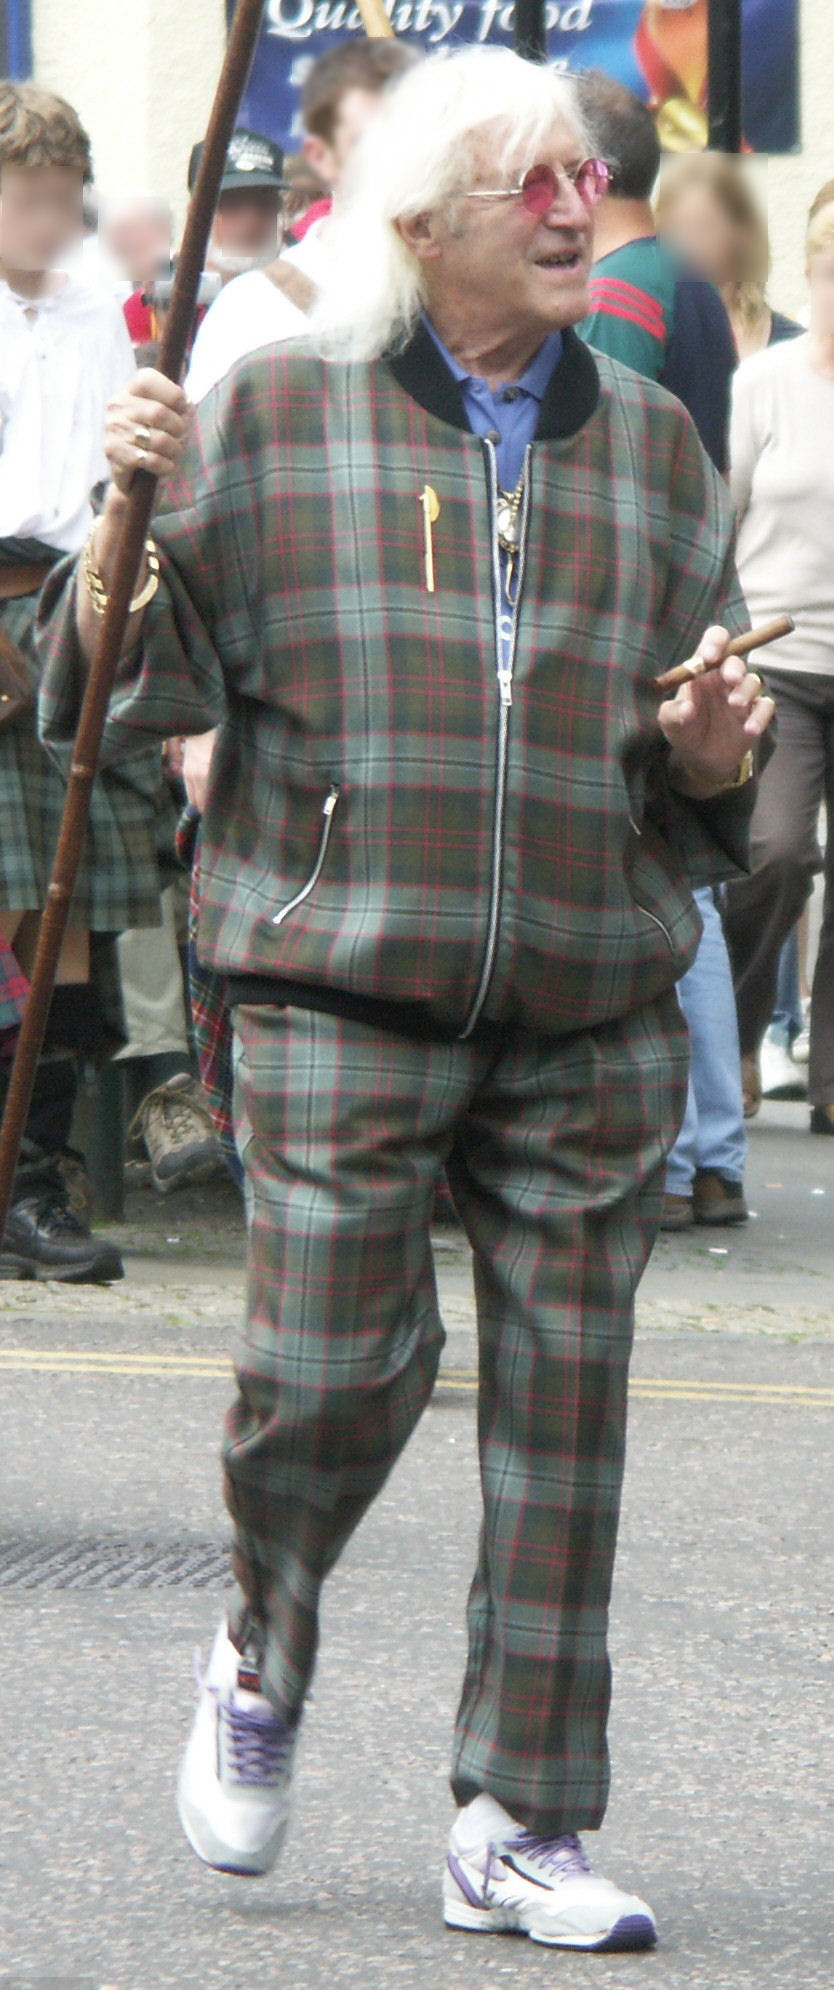 Jimmy Savile, men's rights martyr (via)